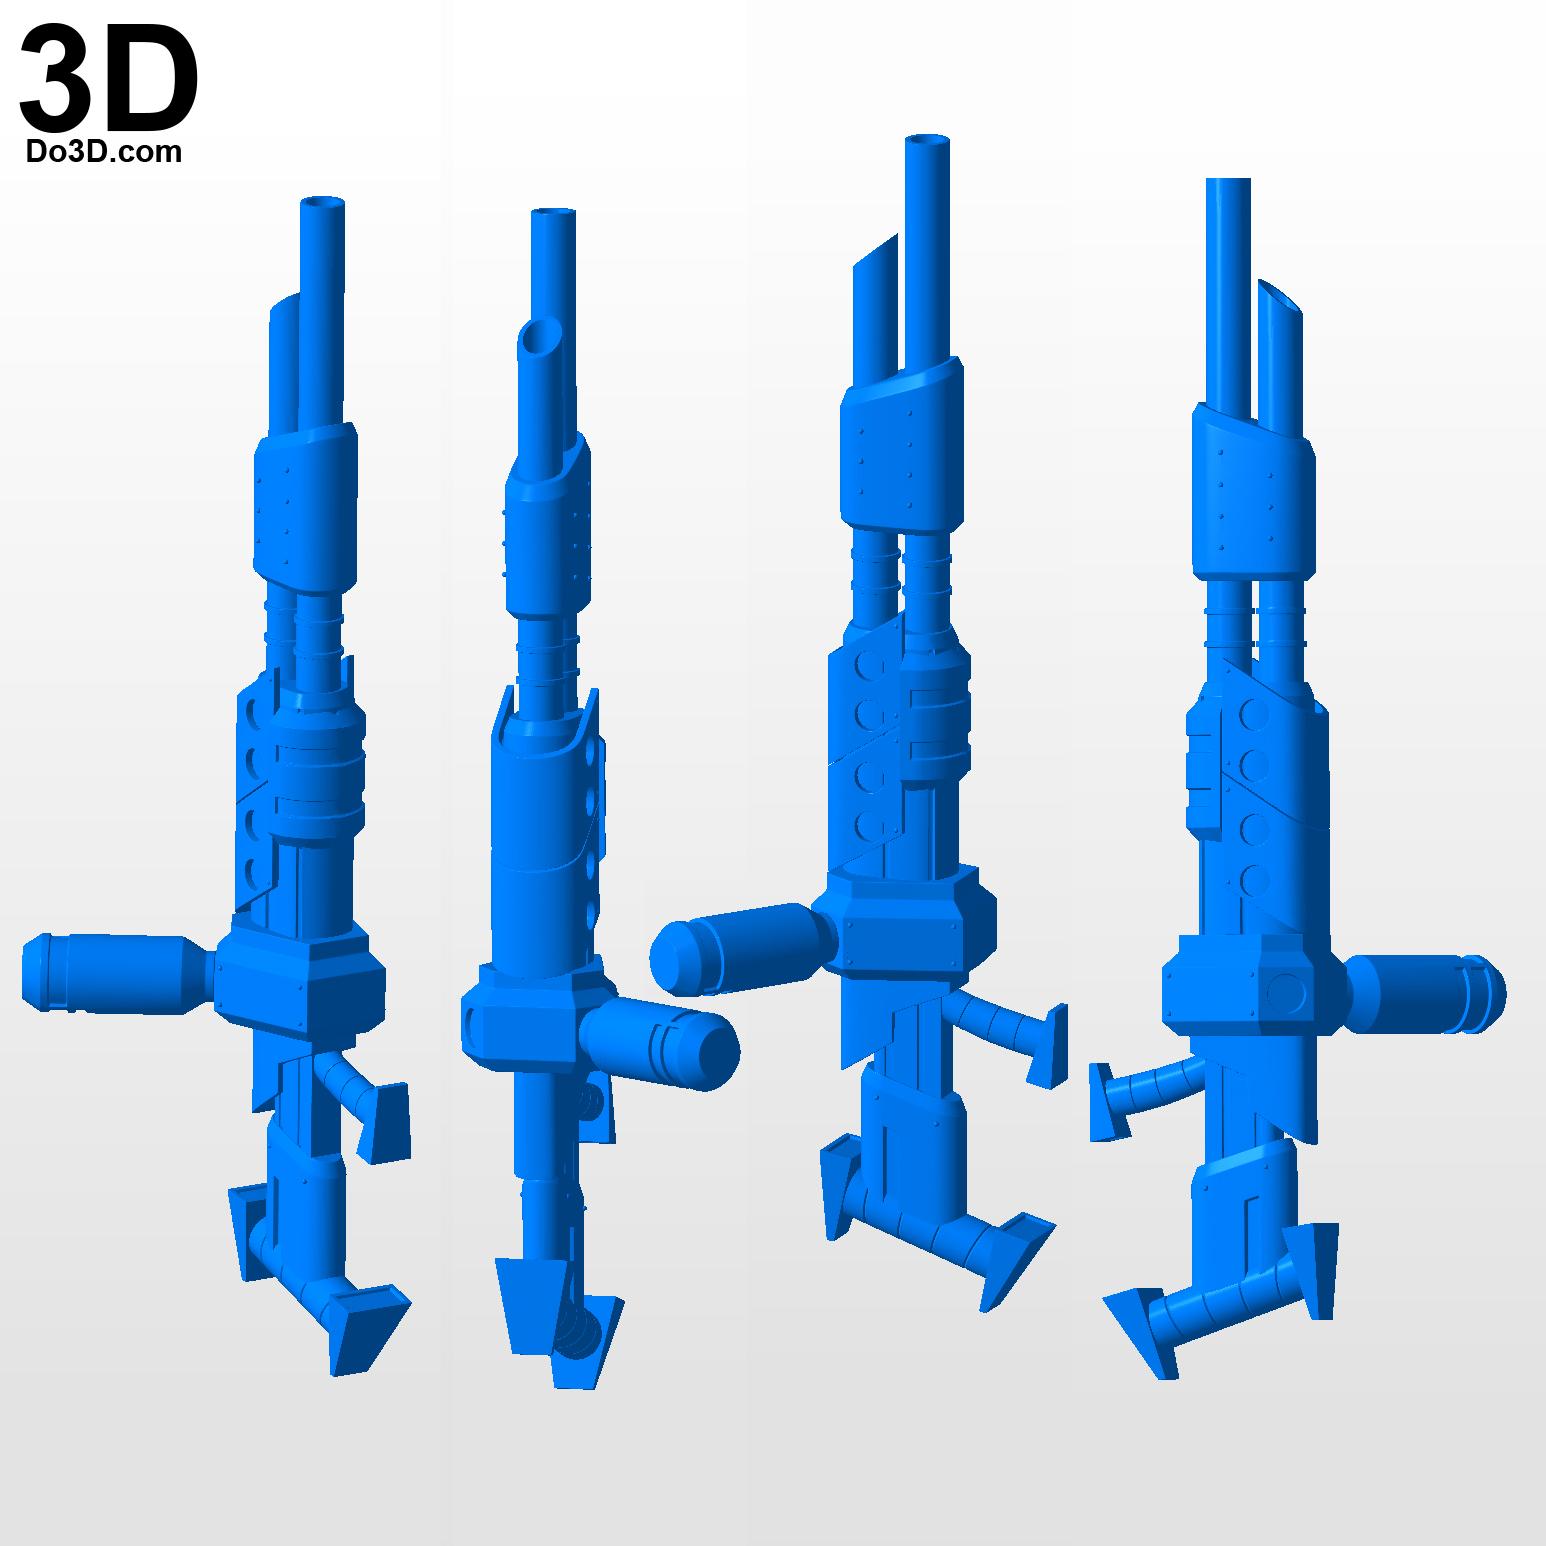 3D Printable Model: The Morph Gun Blaster Jak 2 II And Jak